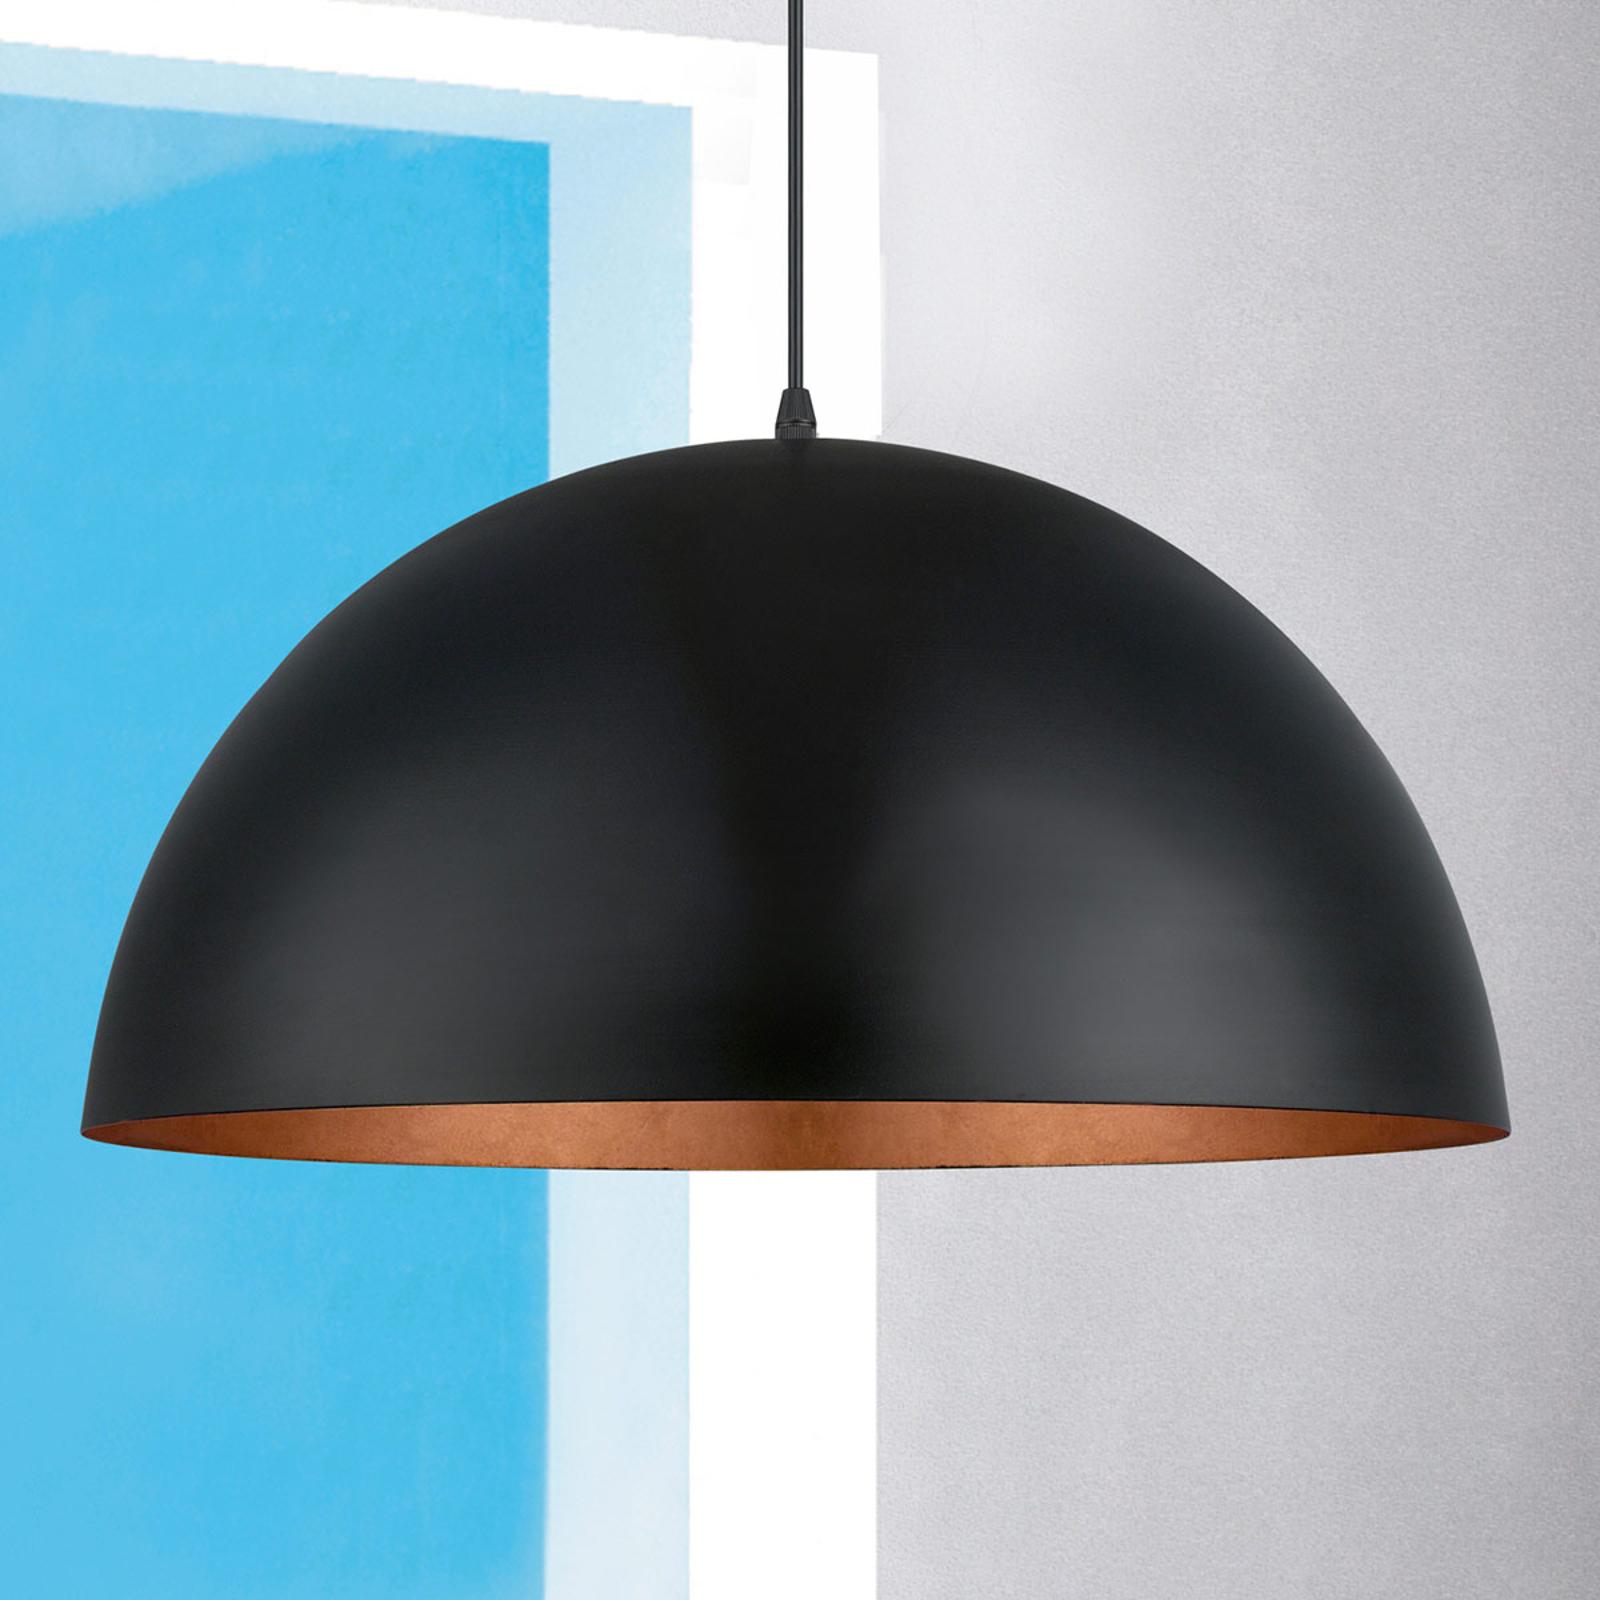 Hengelampe Gaetano 1, svart/kobber